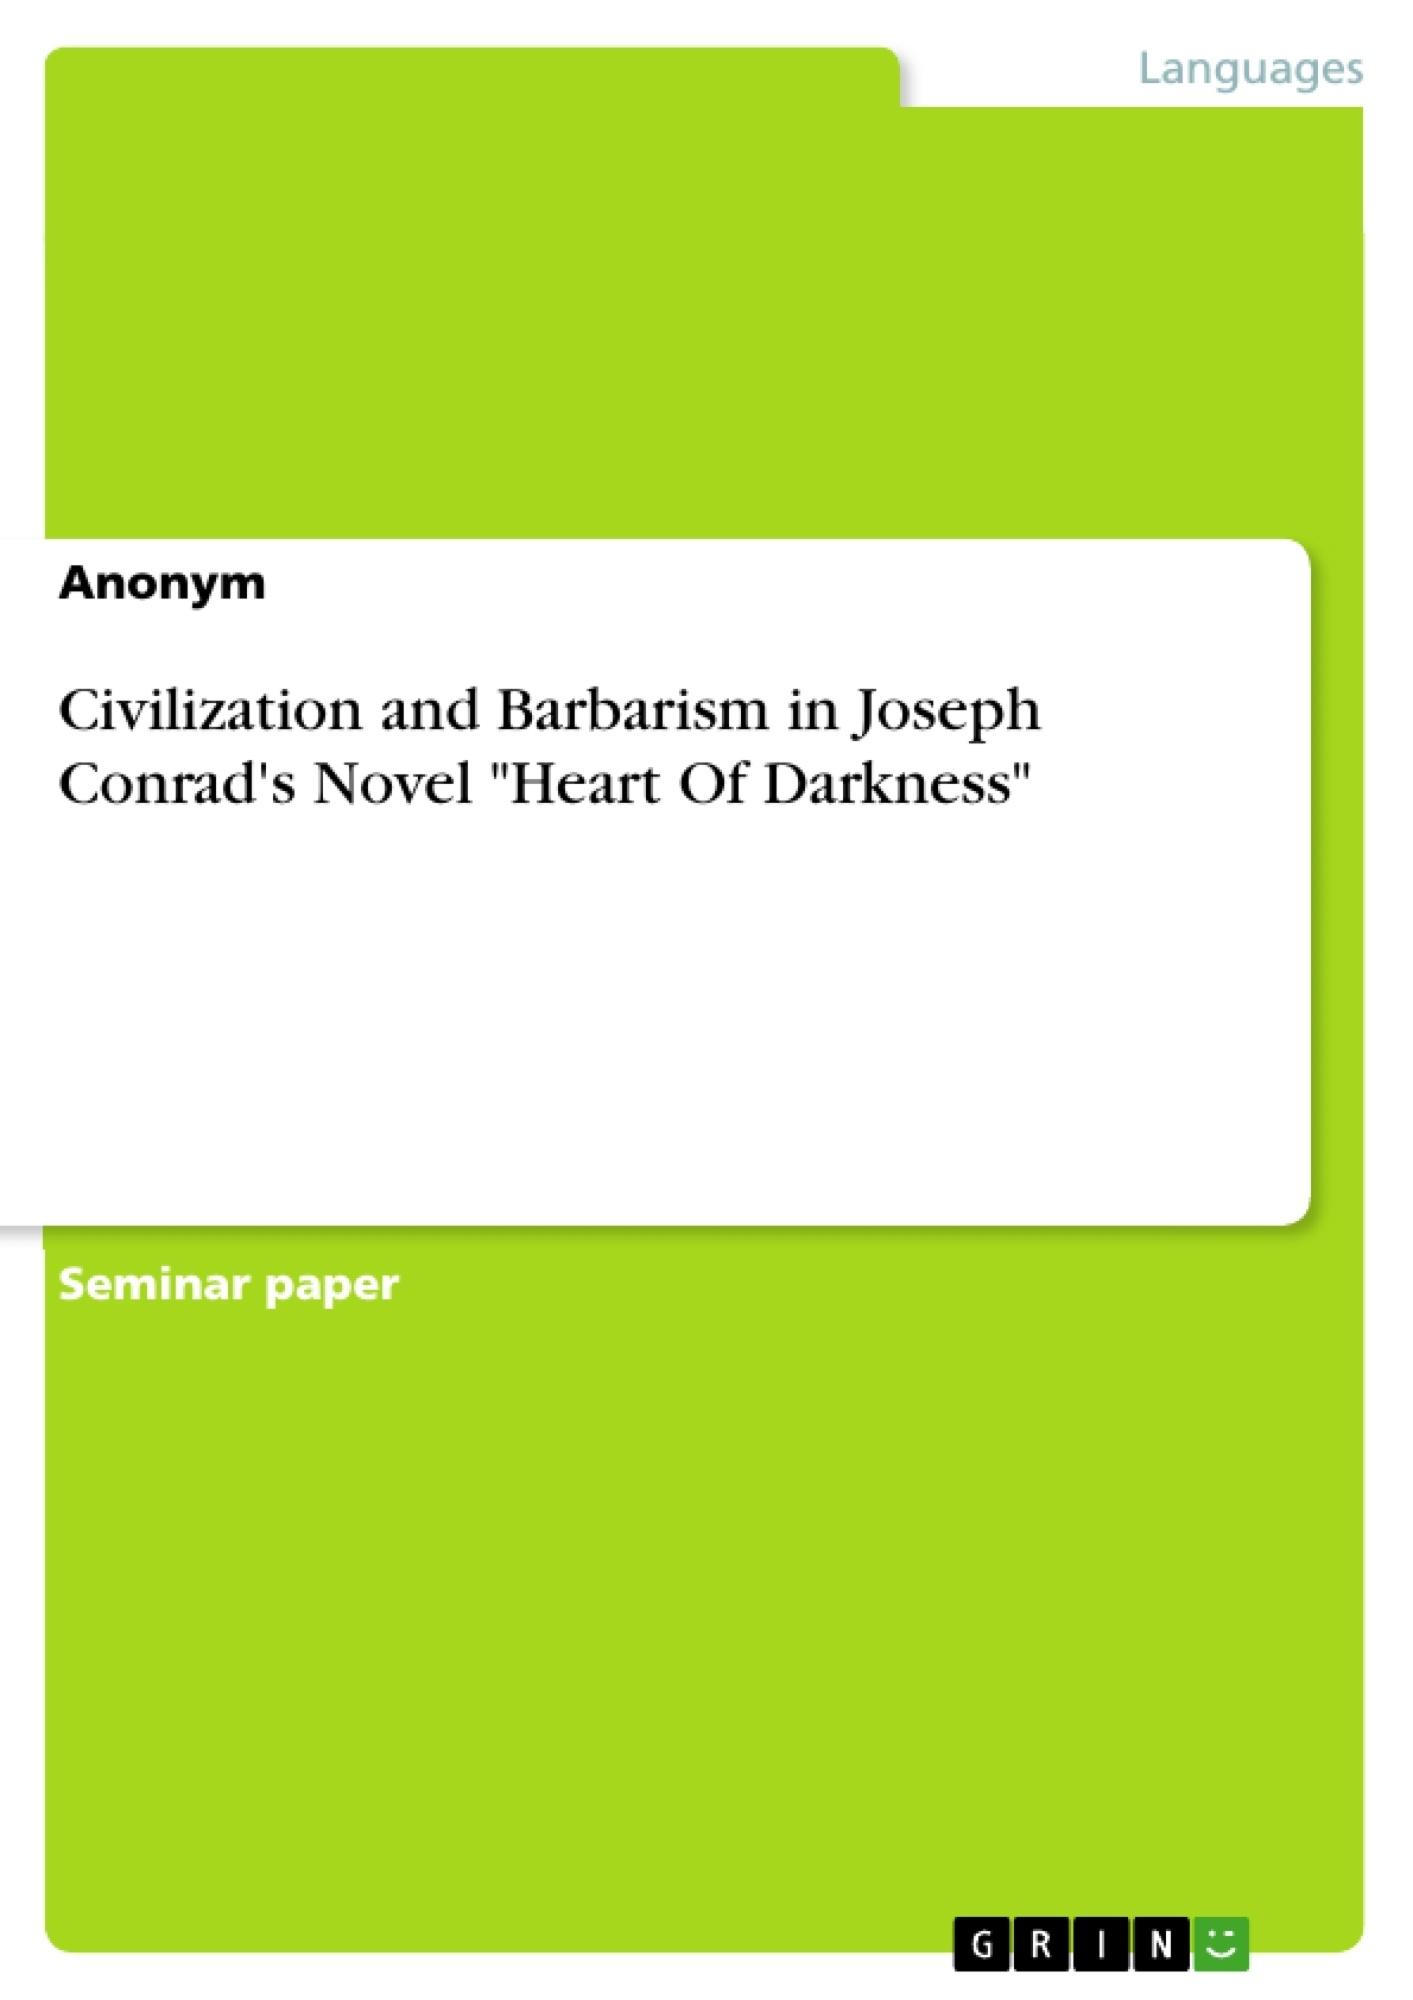 Joseph conrads heart of darkness essay